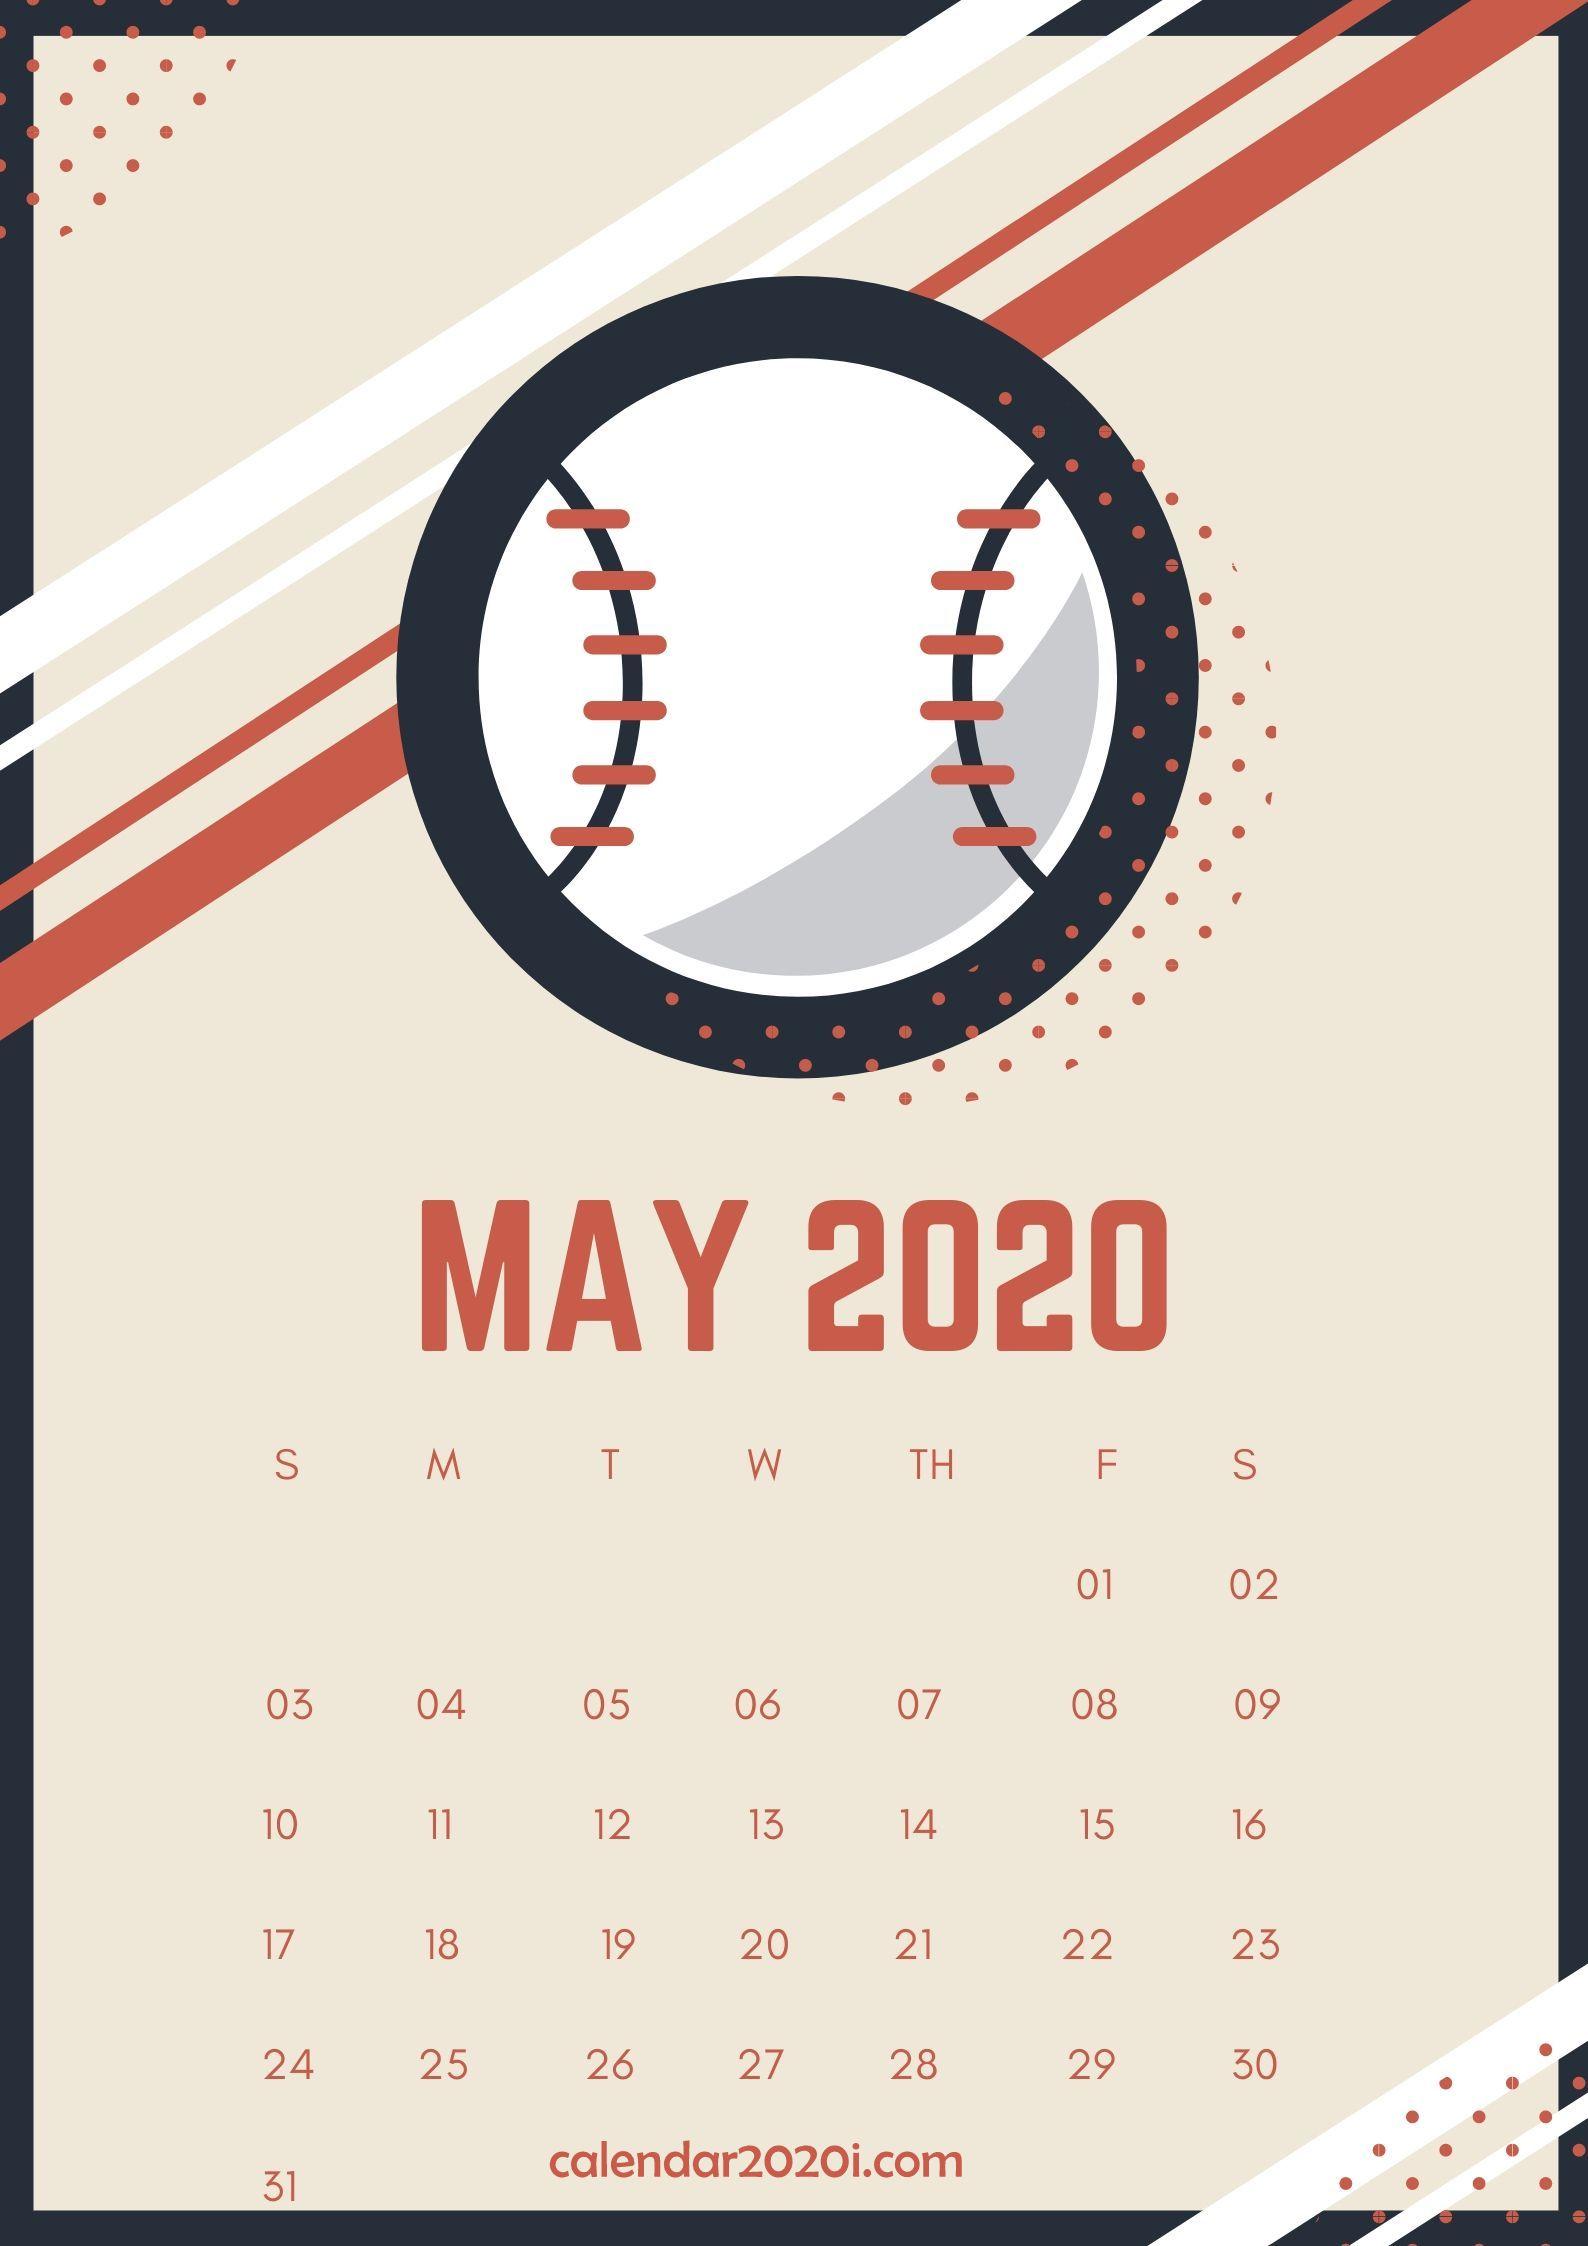 May 2020 Wall Calendar Printable